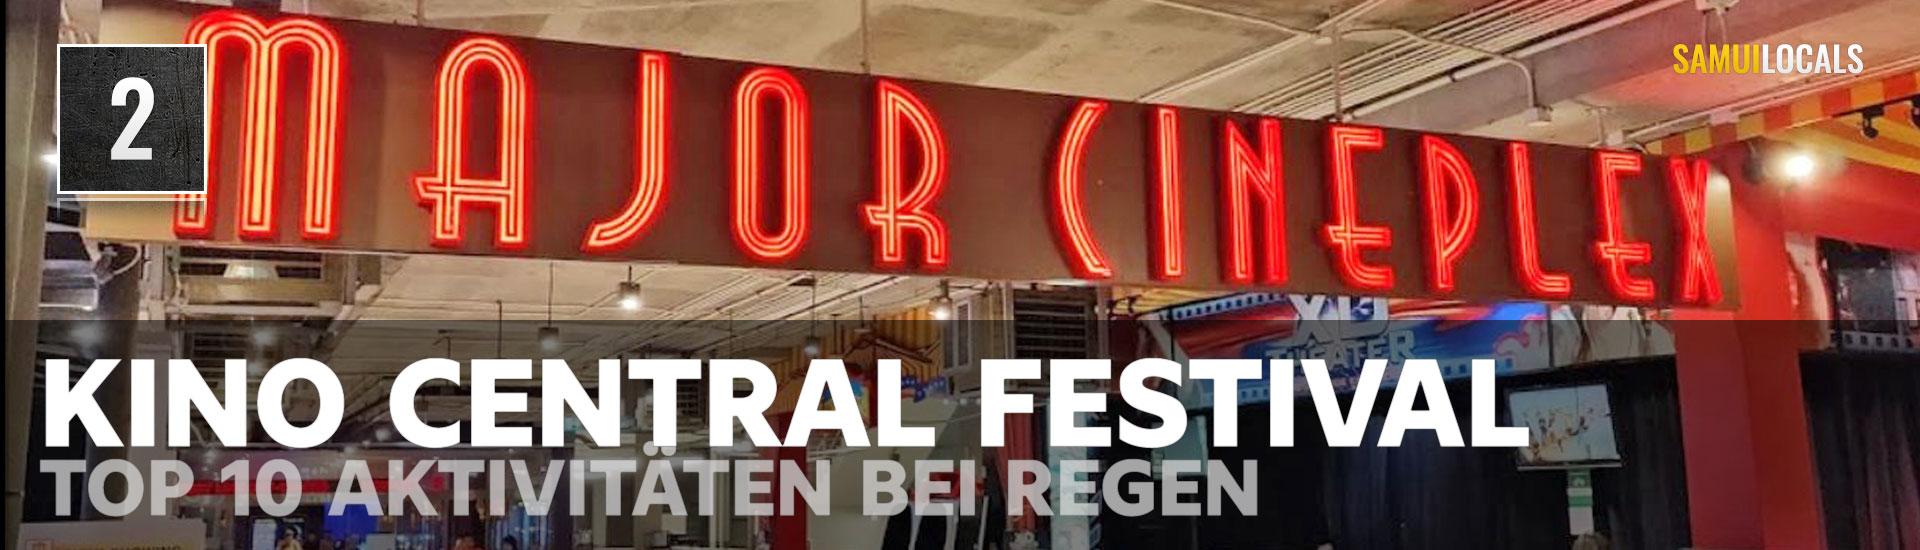 top_10_aktivitaeten_bei_regen_kino_central_festival